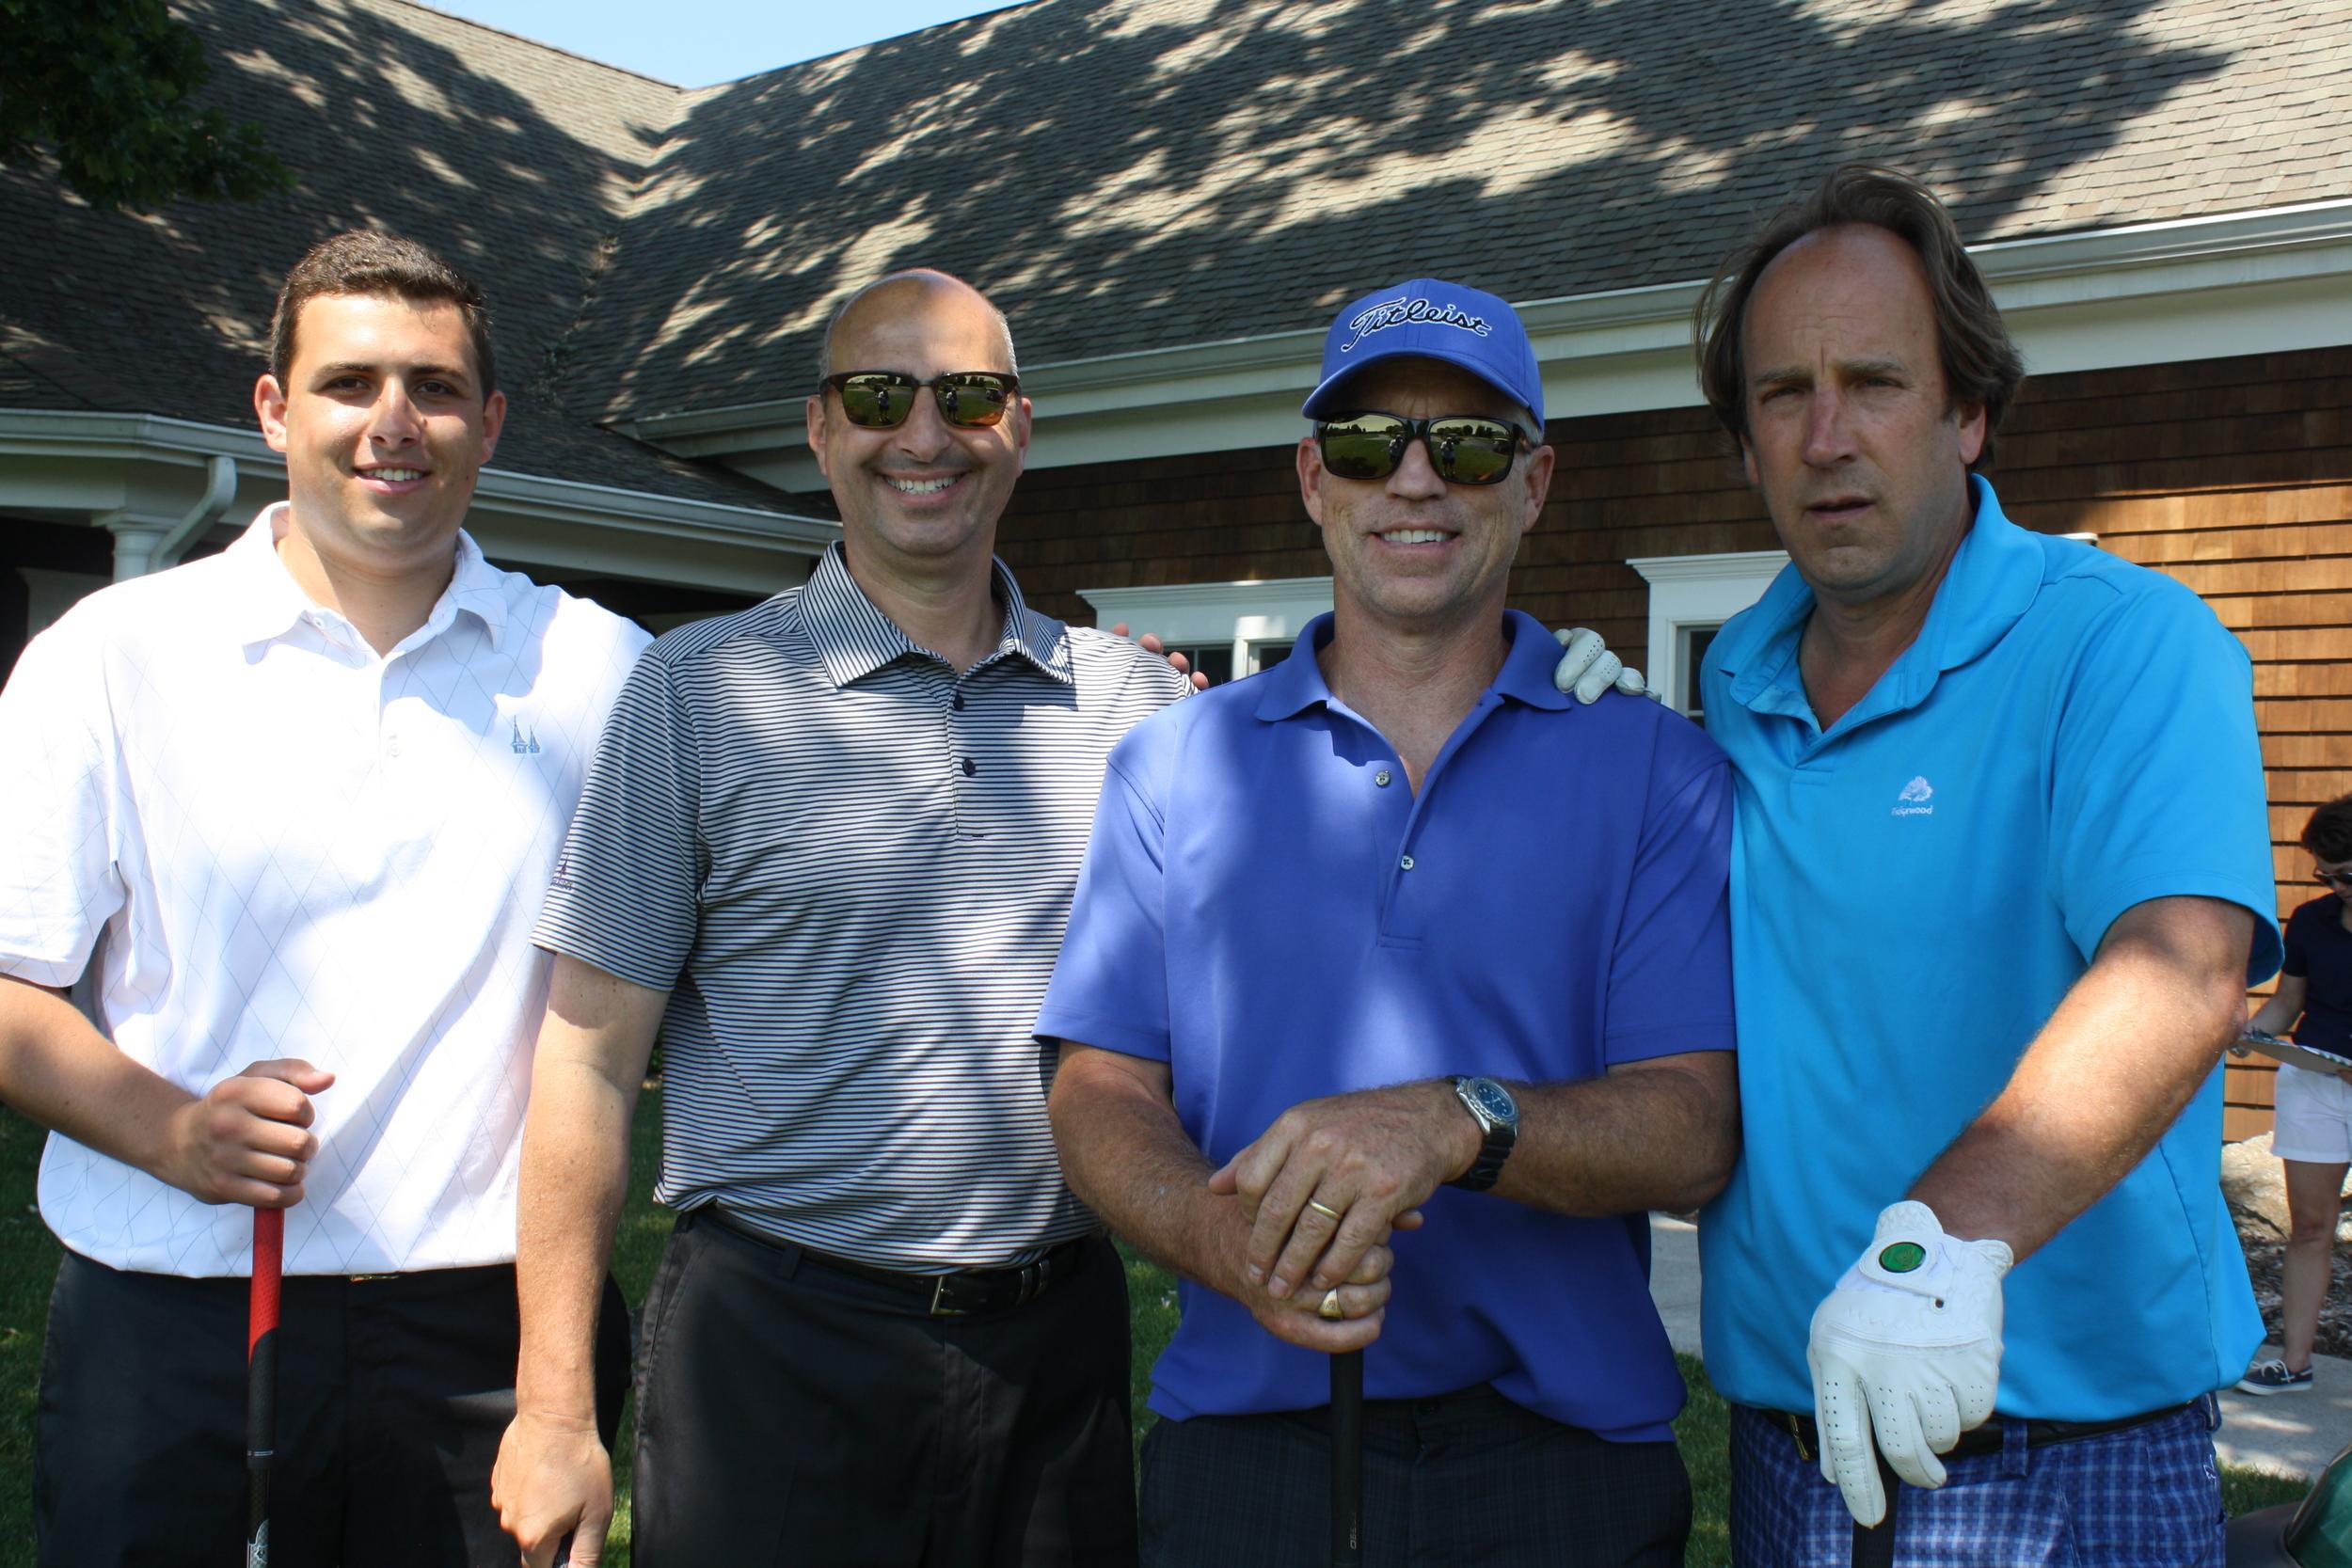 14 Phil Cappelli, George Trudell, Jay Maher, Bob Gleason.JPG